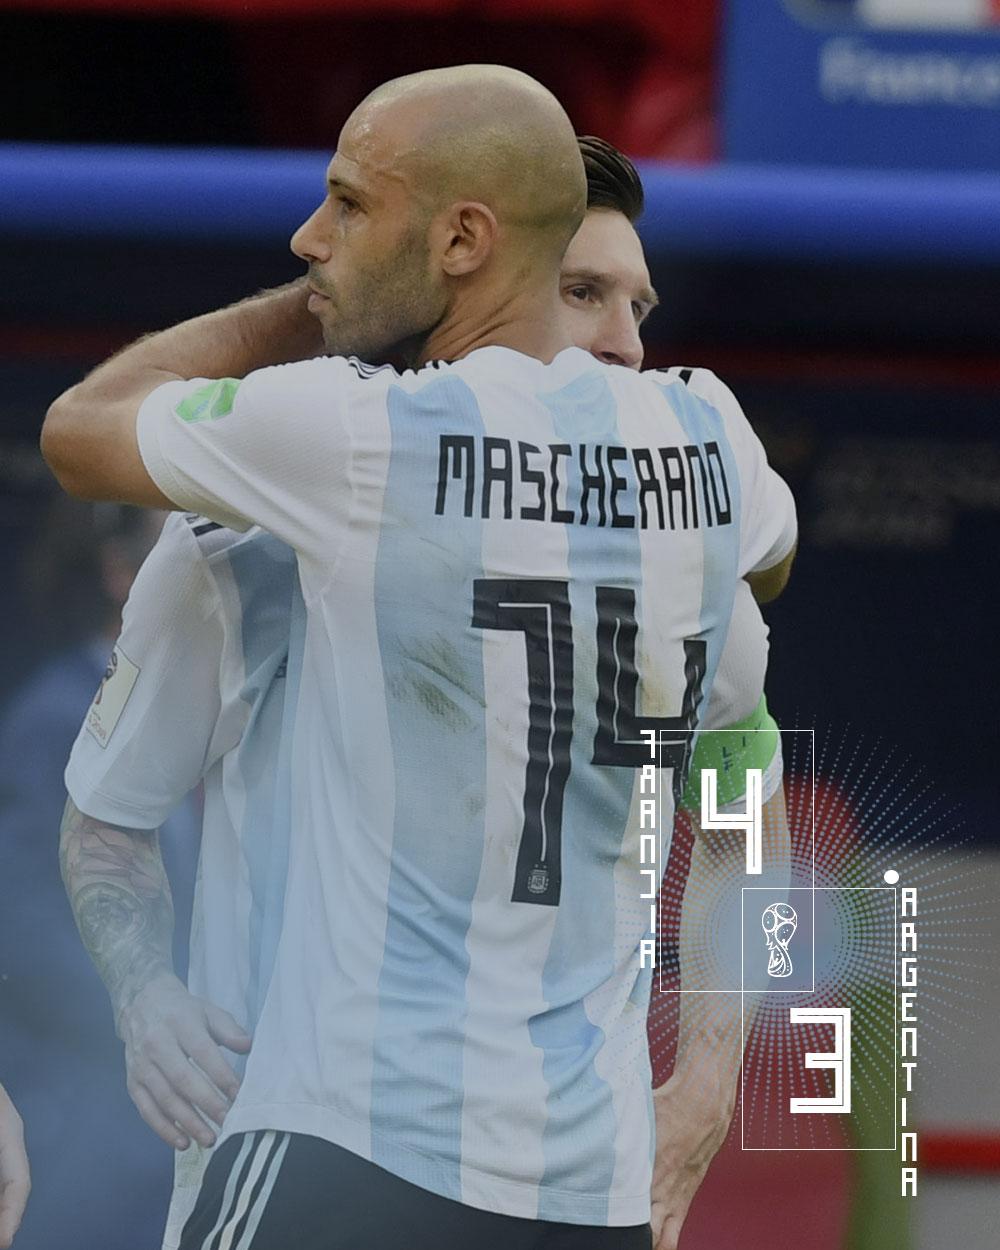 Francia 2 Argentina 4 Rusia 2018 Off Topic Periodismo Transmedia